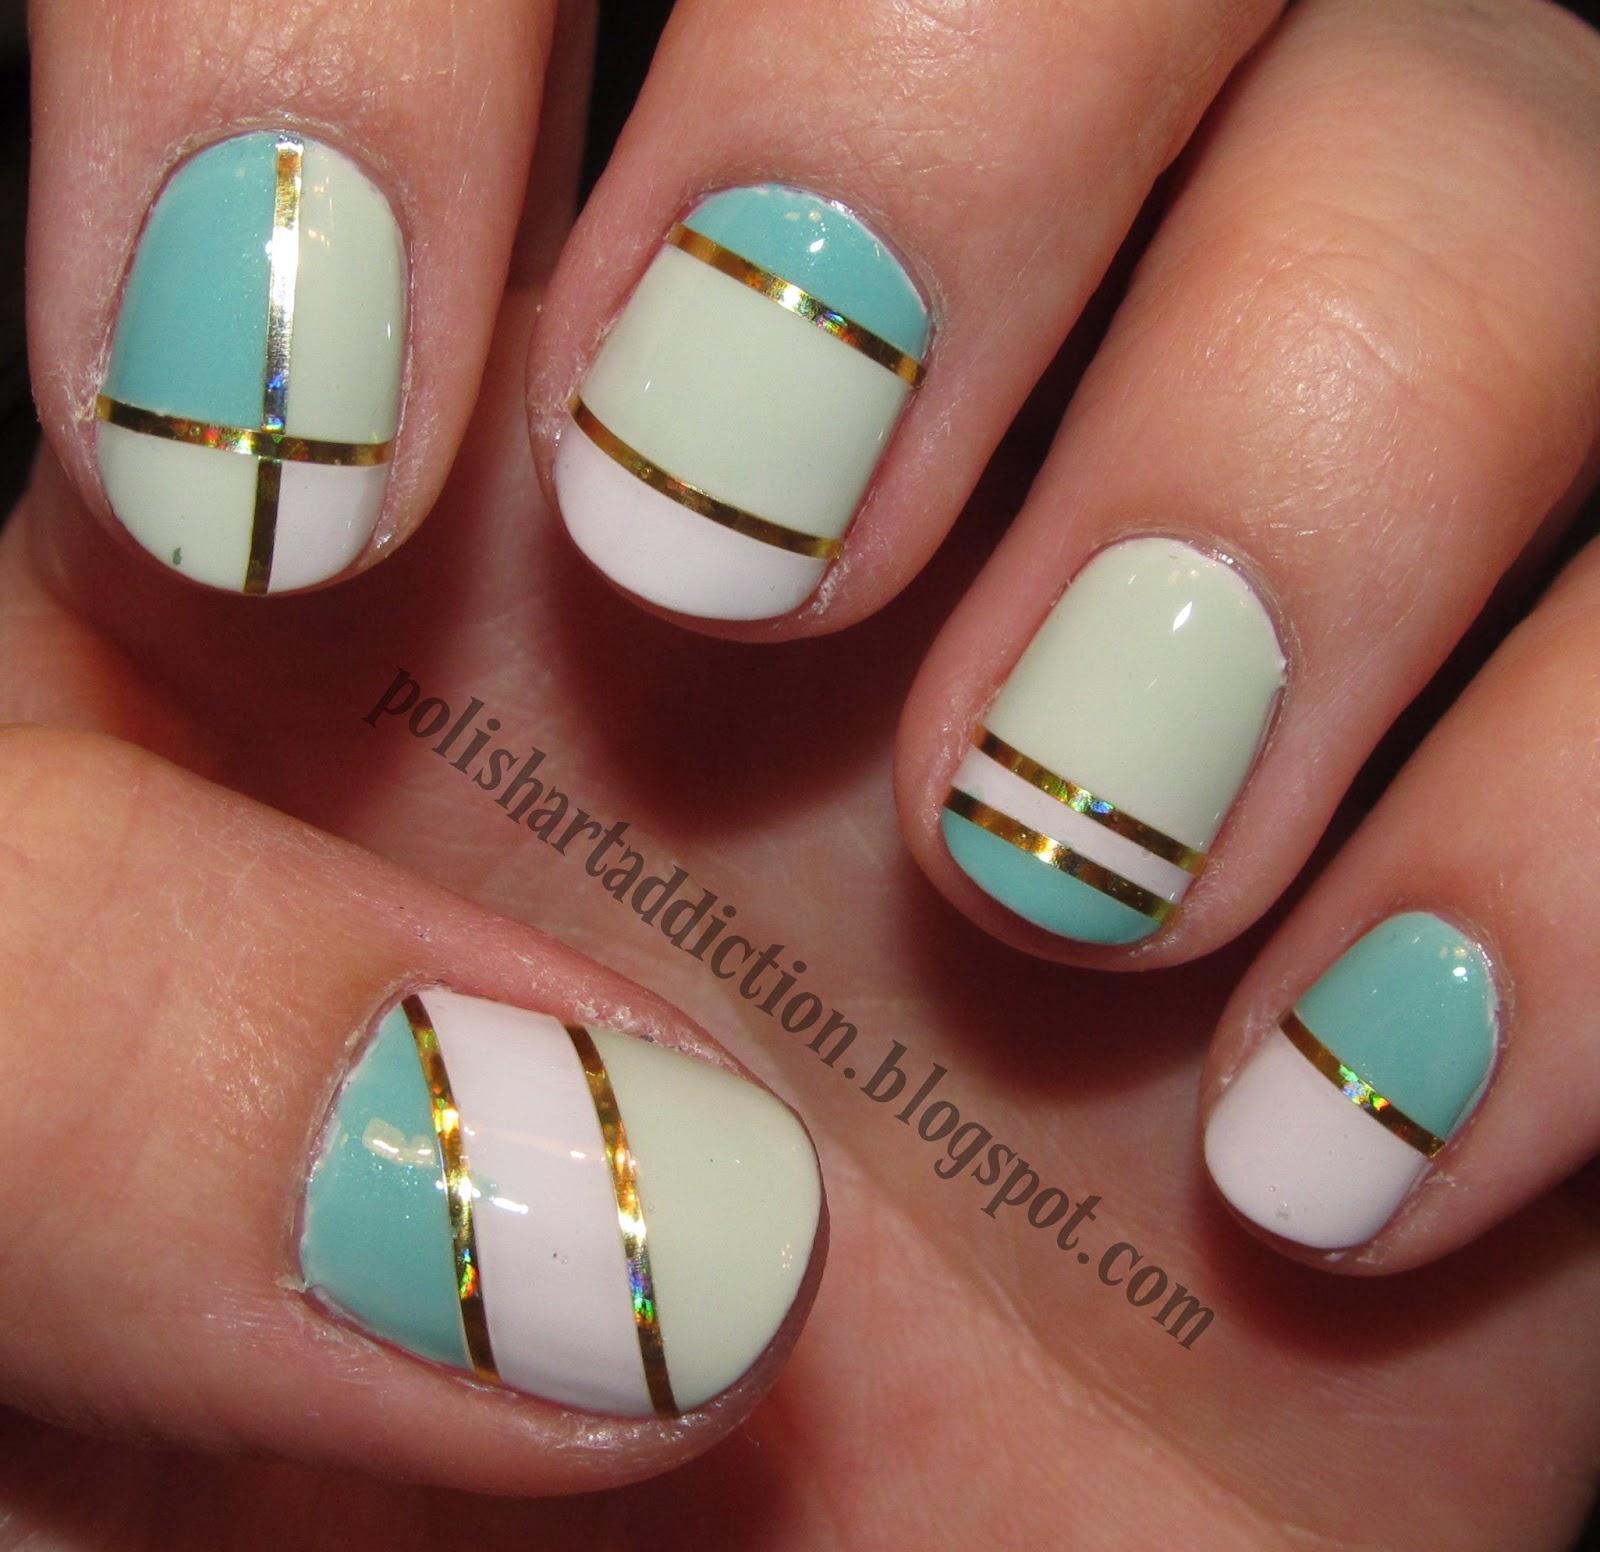 Nail Designs Scotch Tape#*^